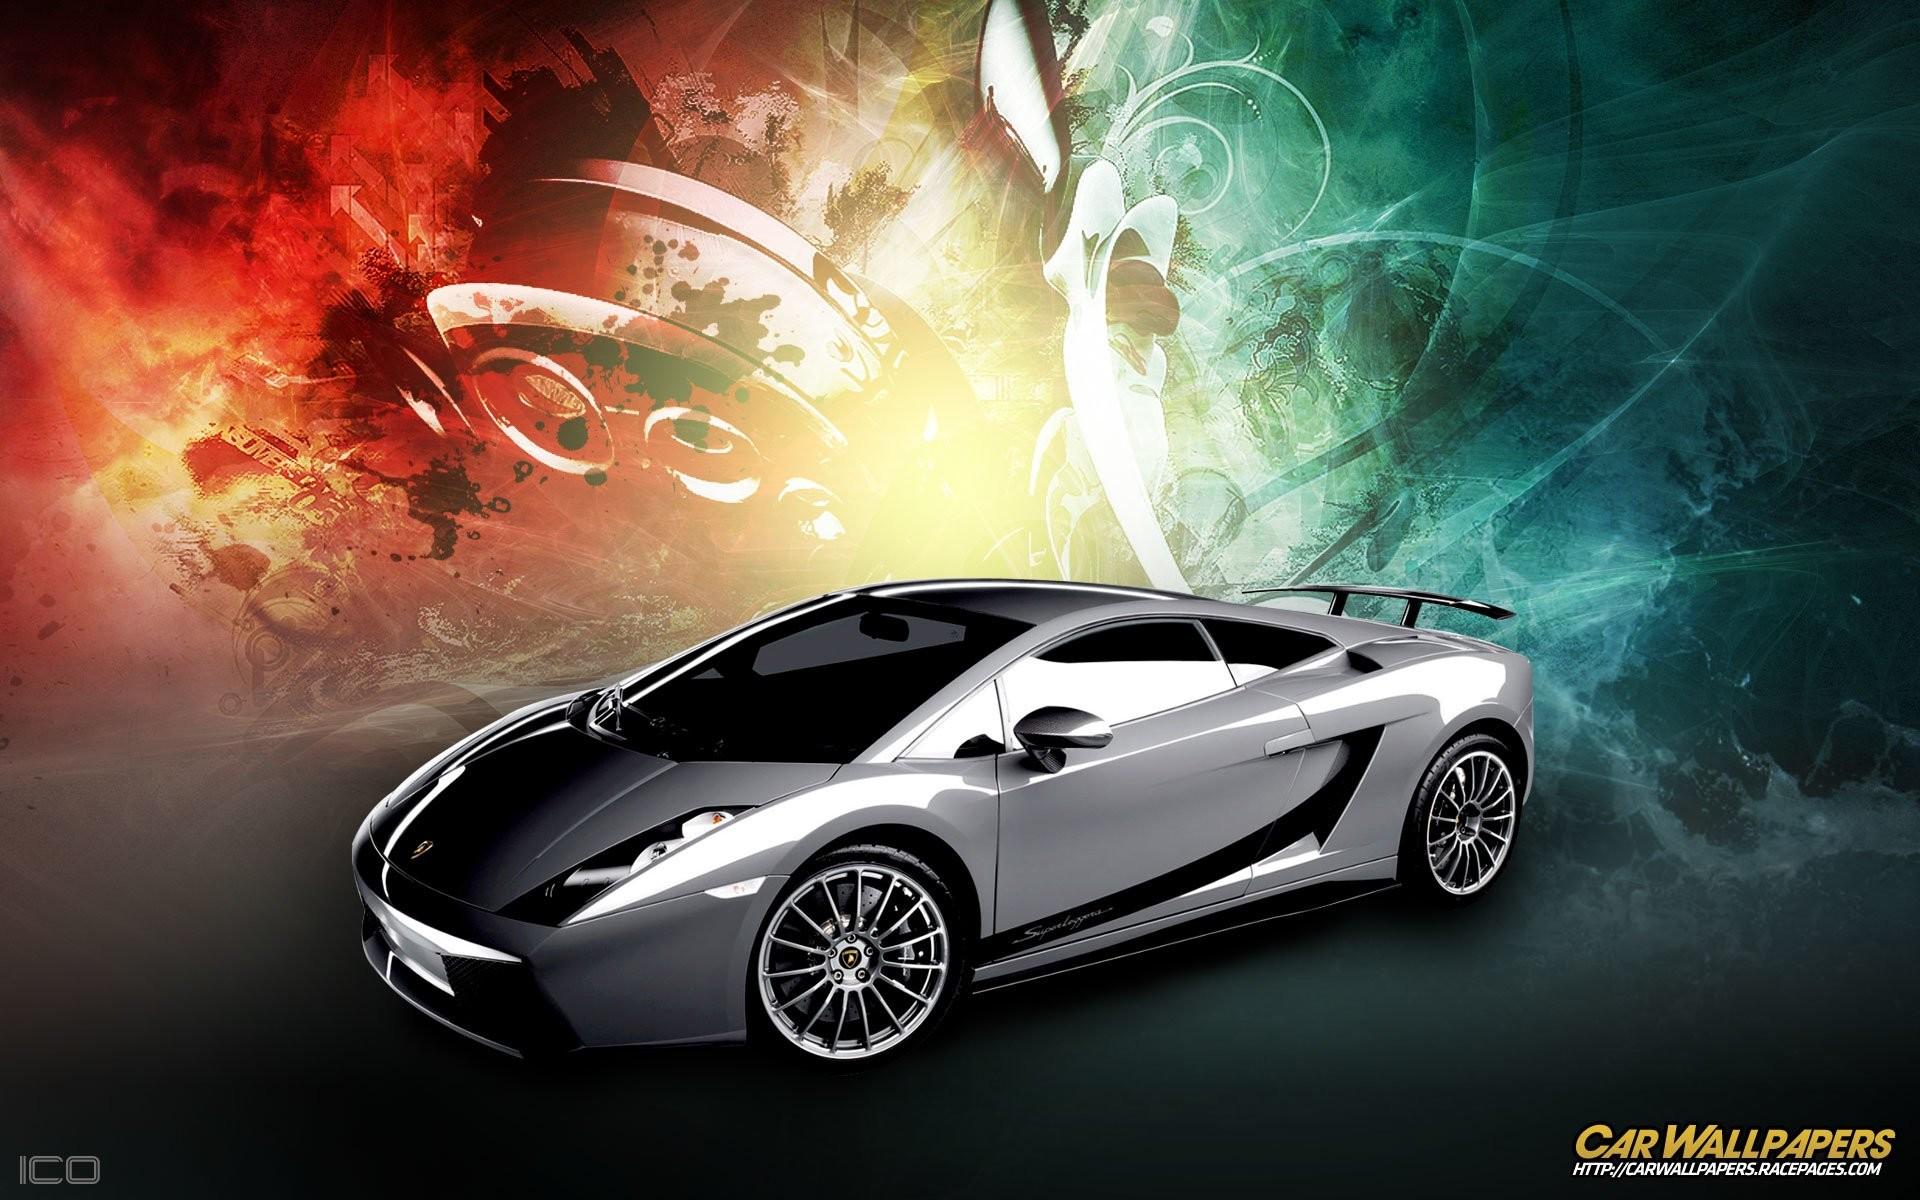 1920x1200 1920x1200 Fahrzeuge - Lamborghini Wallpaper